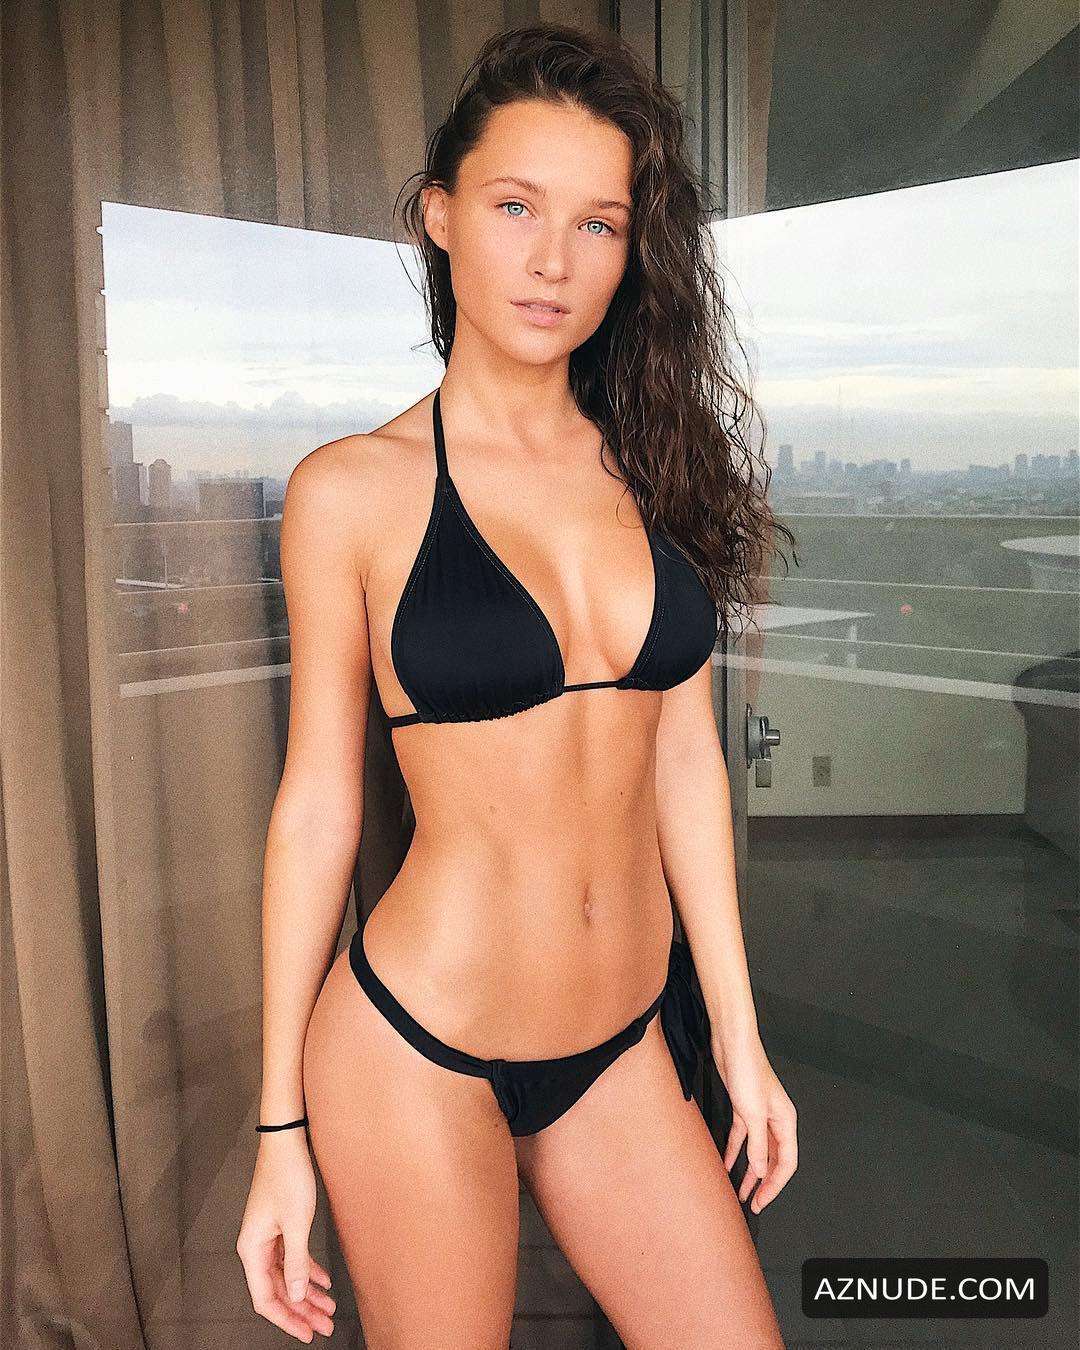 Anastasiya Nude anastasiya primak nude - aznude